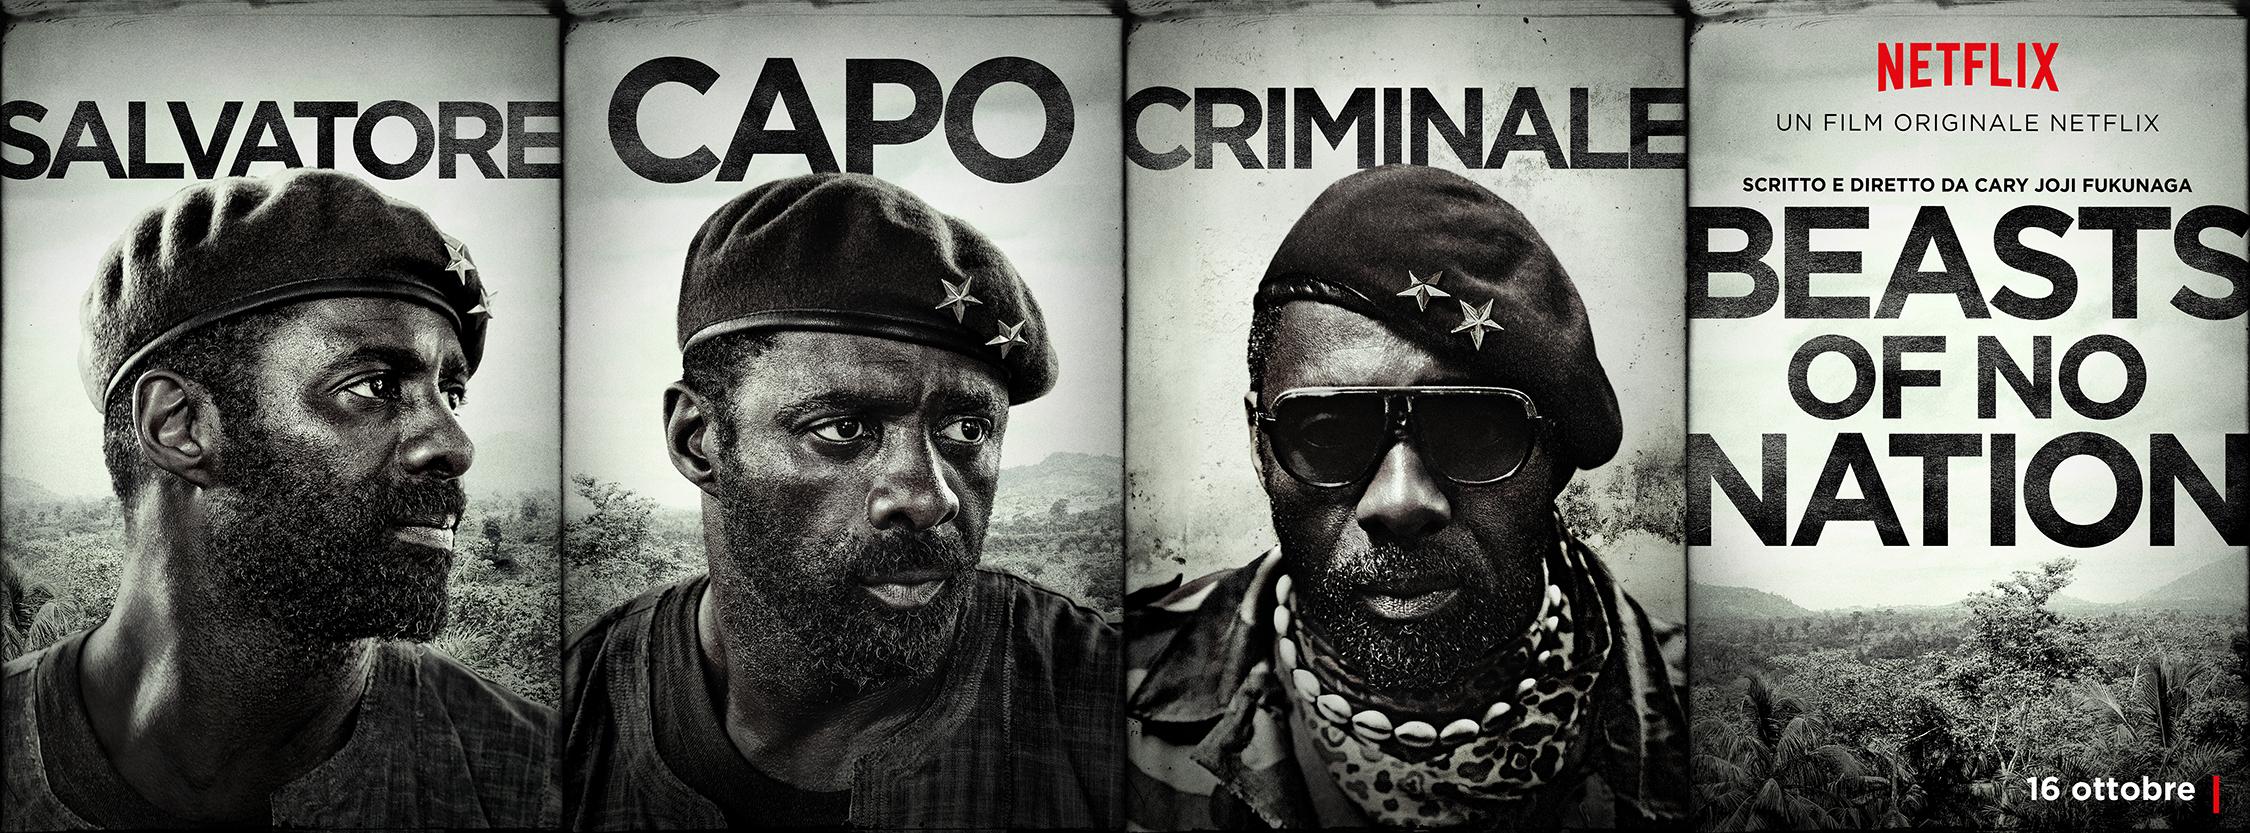 Beasts of No Nation: il character poster di Idris Elba